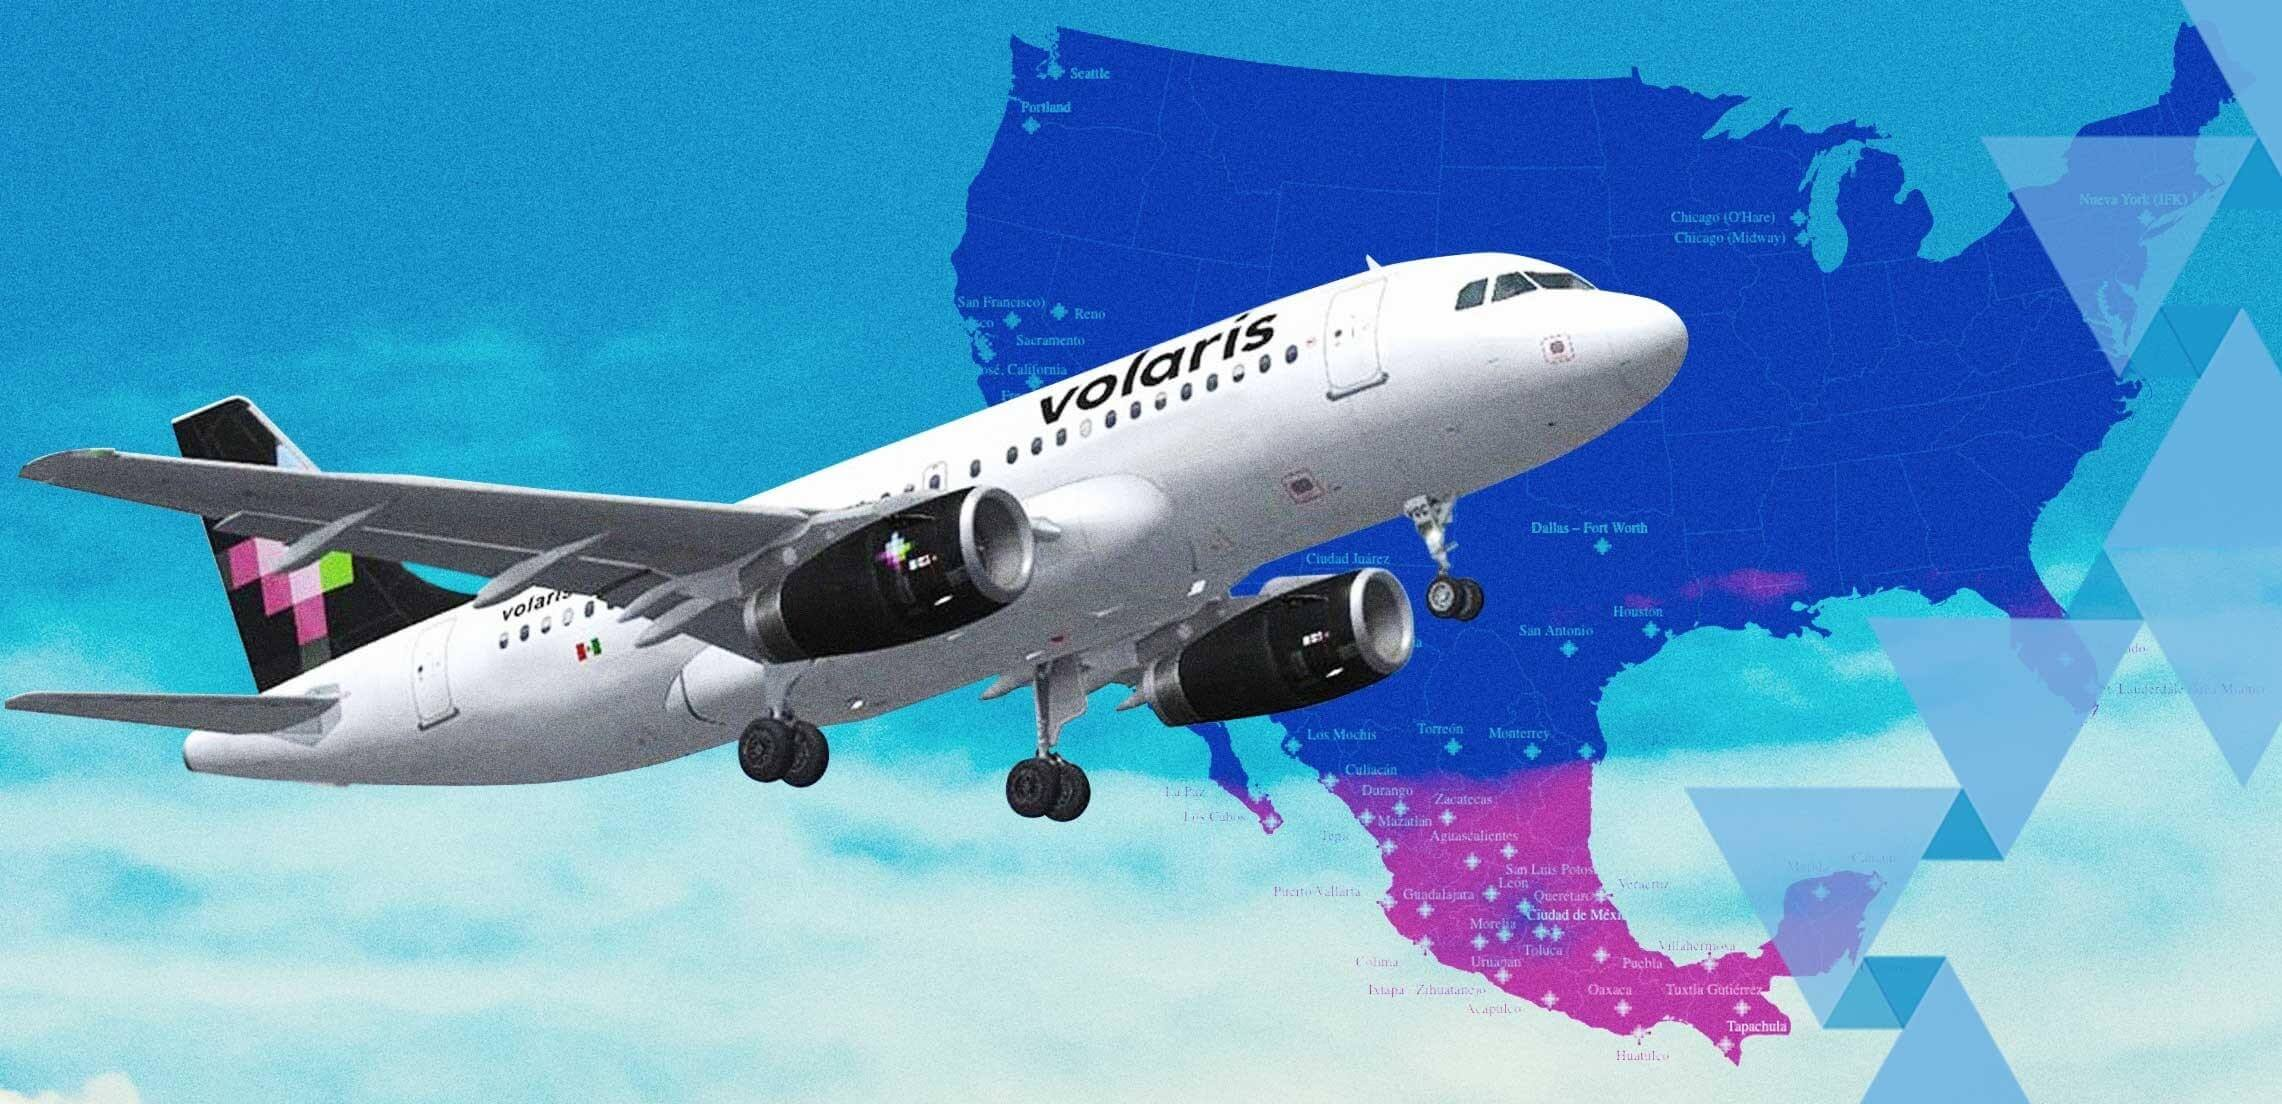 Mexico's Volaris cuts capacity to 80%